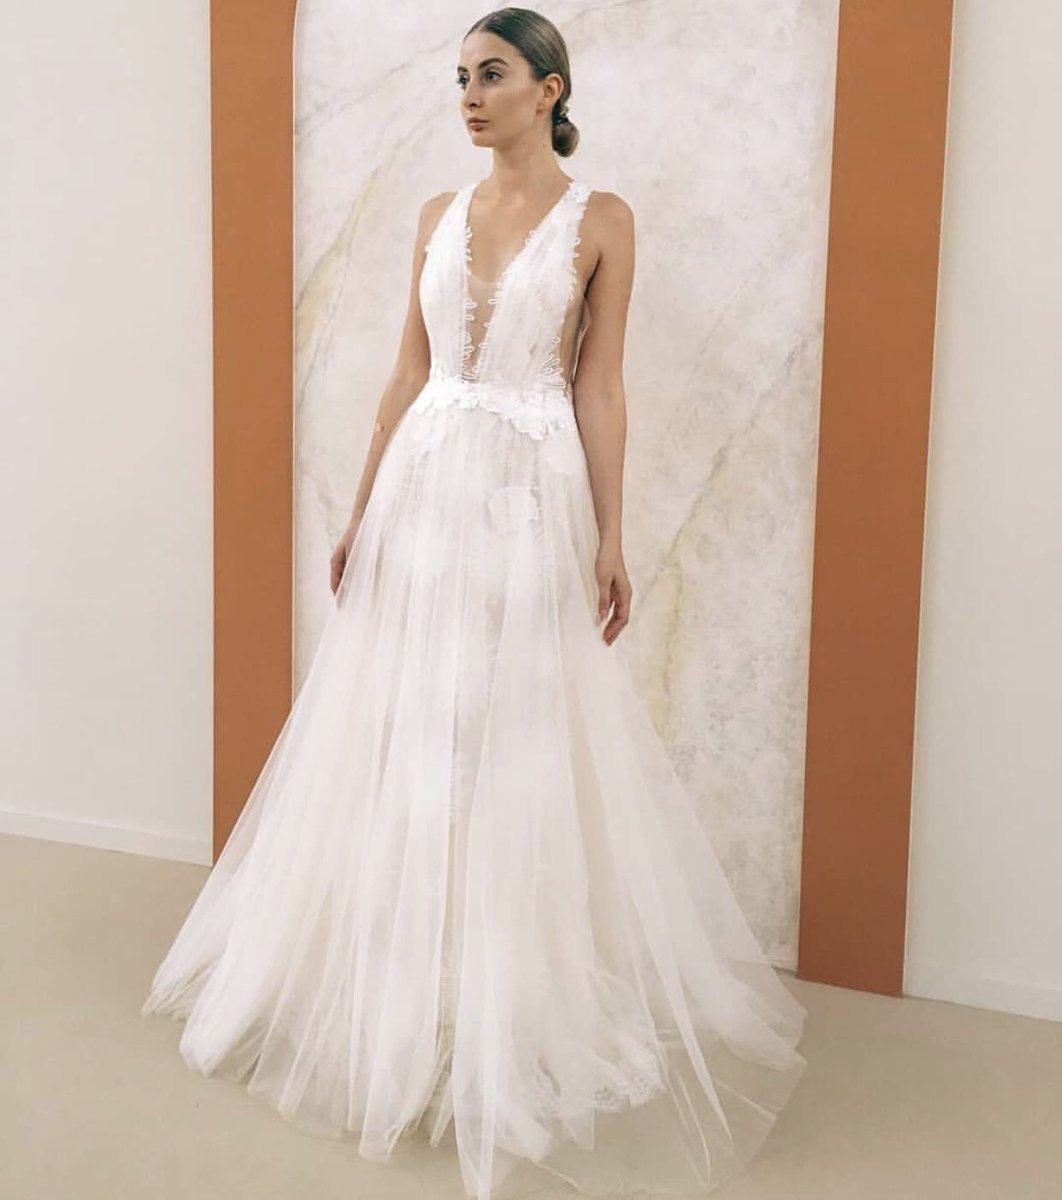 fb13fb54129 Wedding Dress Shops and Bridal Shops in London and Kent   Teokath of ...